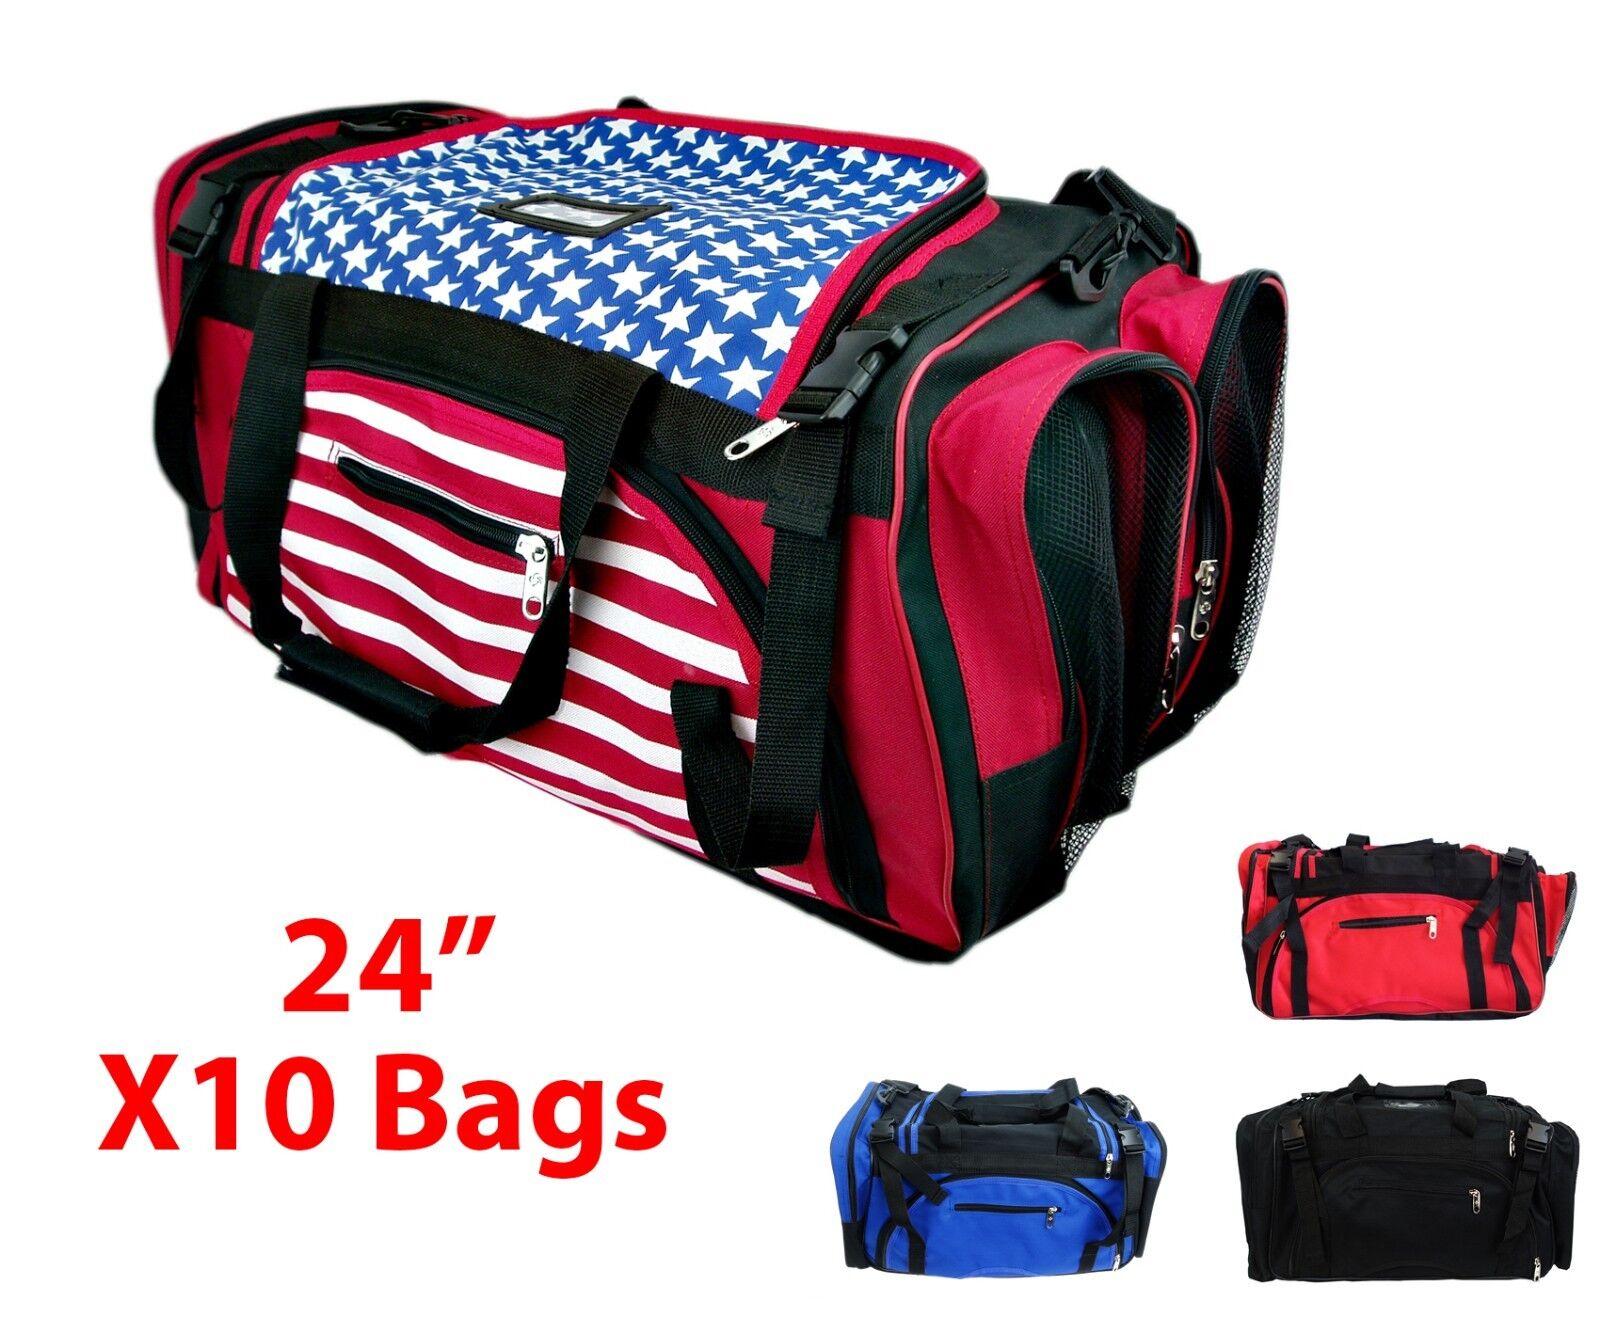 X10 Equipment Gear Bag  Taekwondo Karate MMA Martial Art Deluxe 24  Travel Bag  best choice